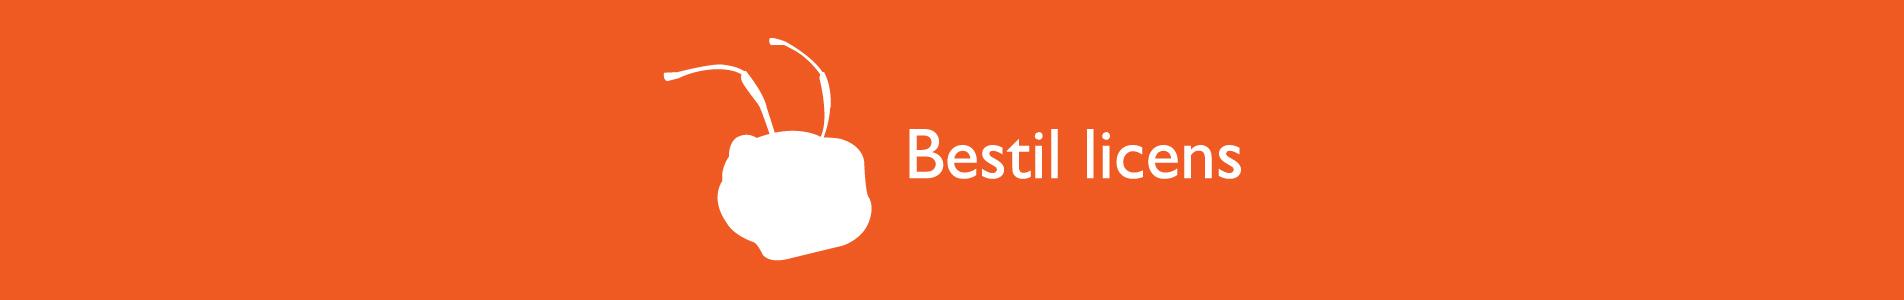 Header med tekst Bestil licens